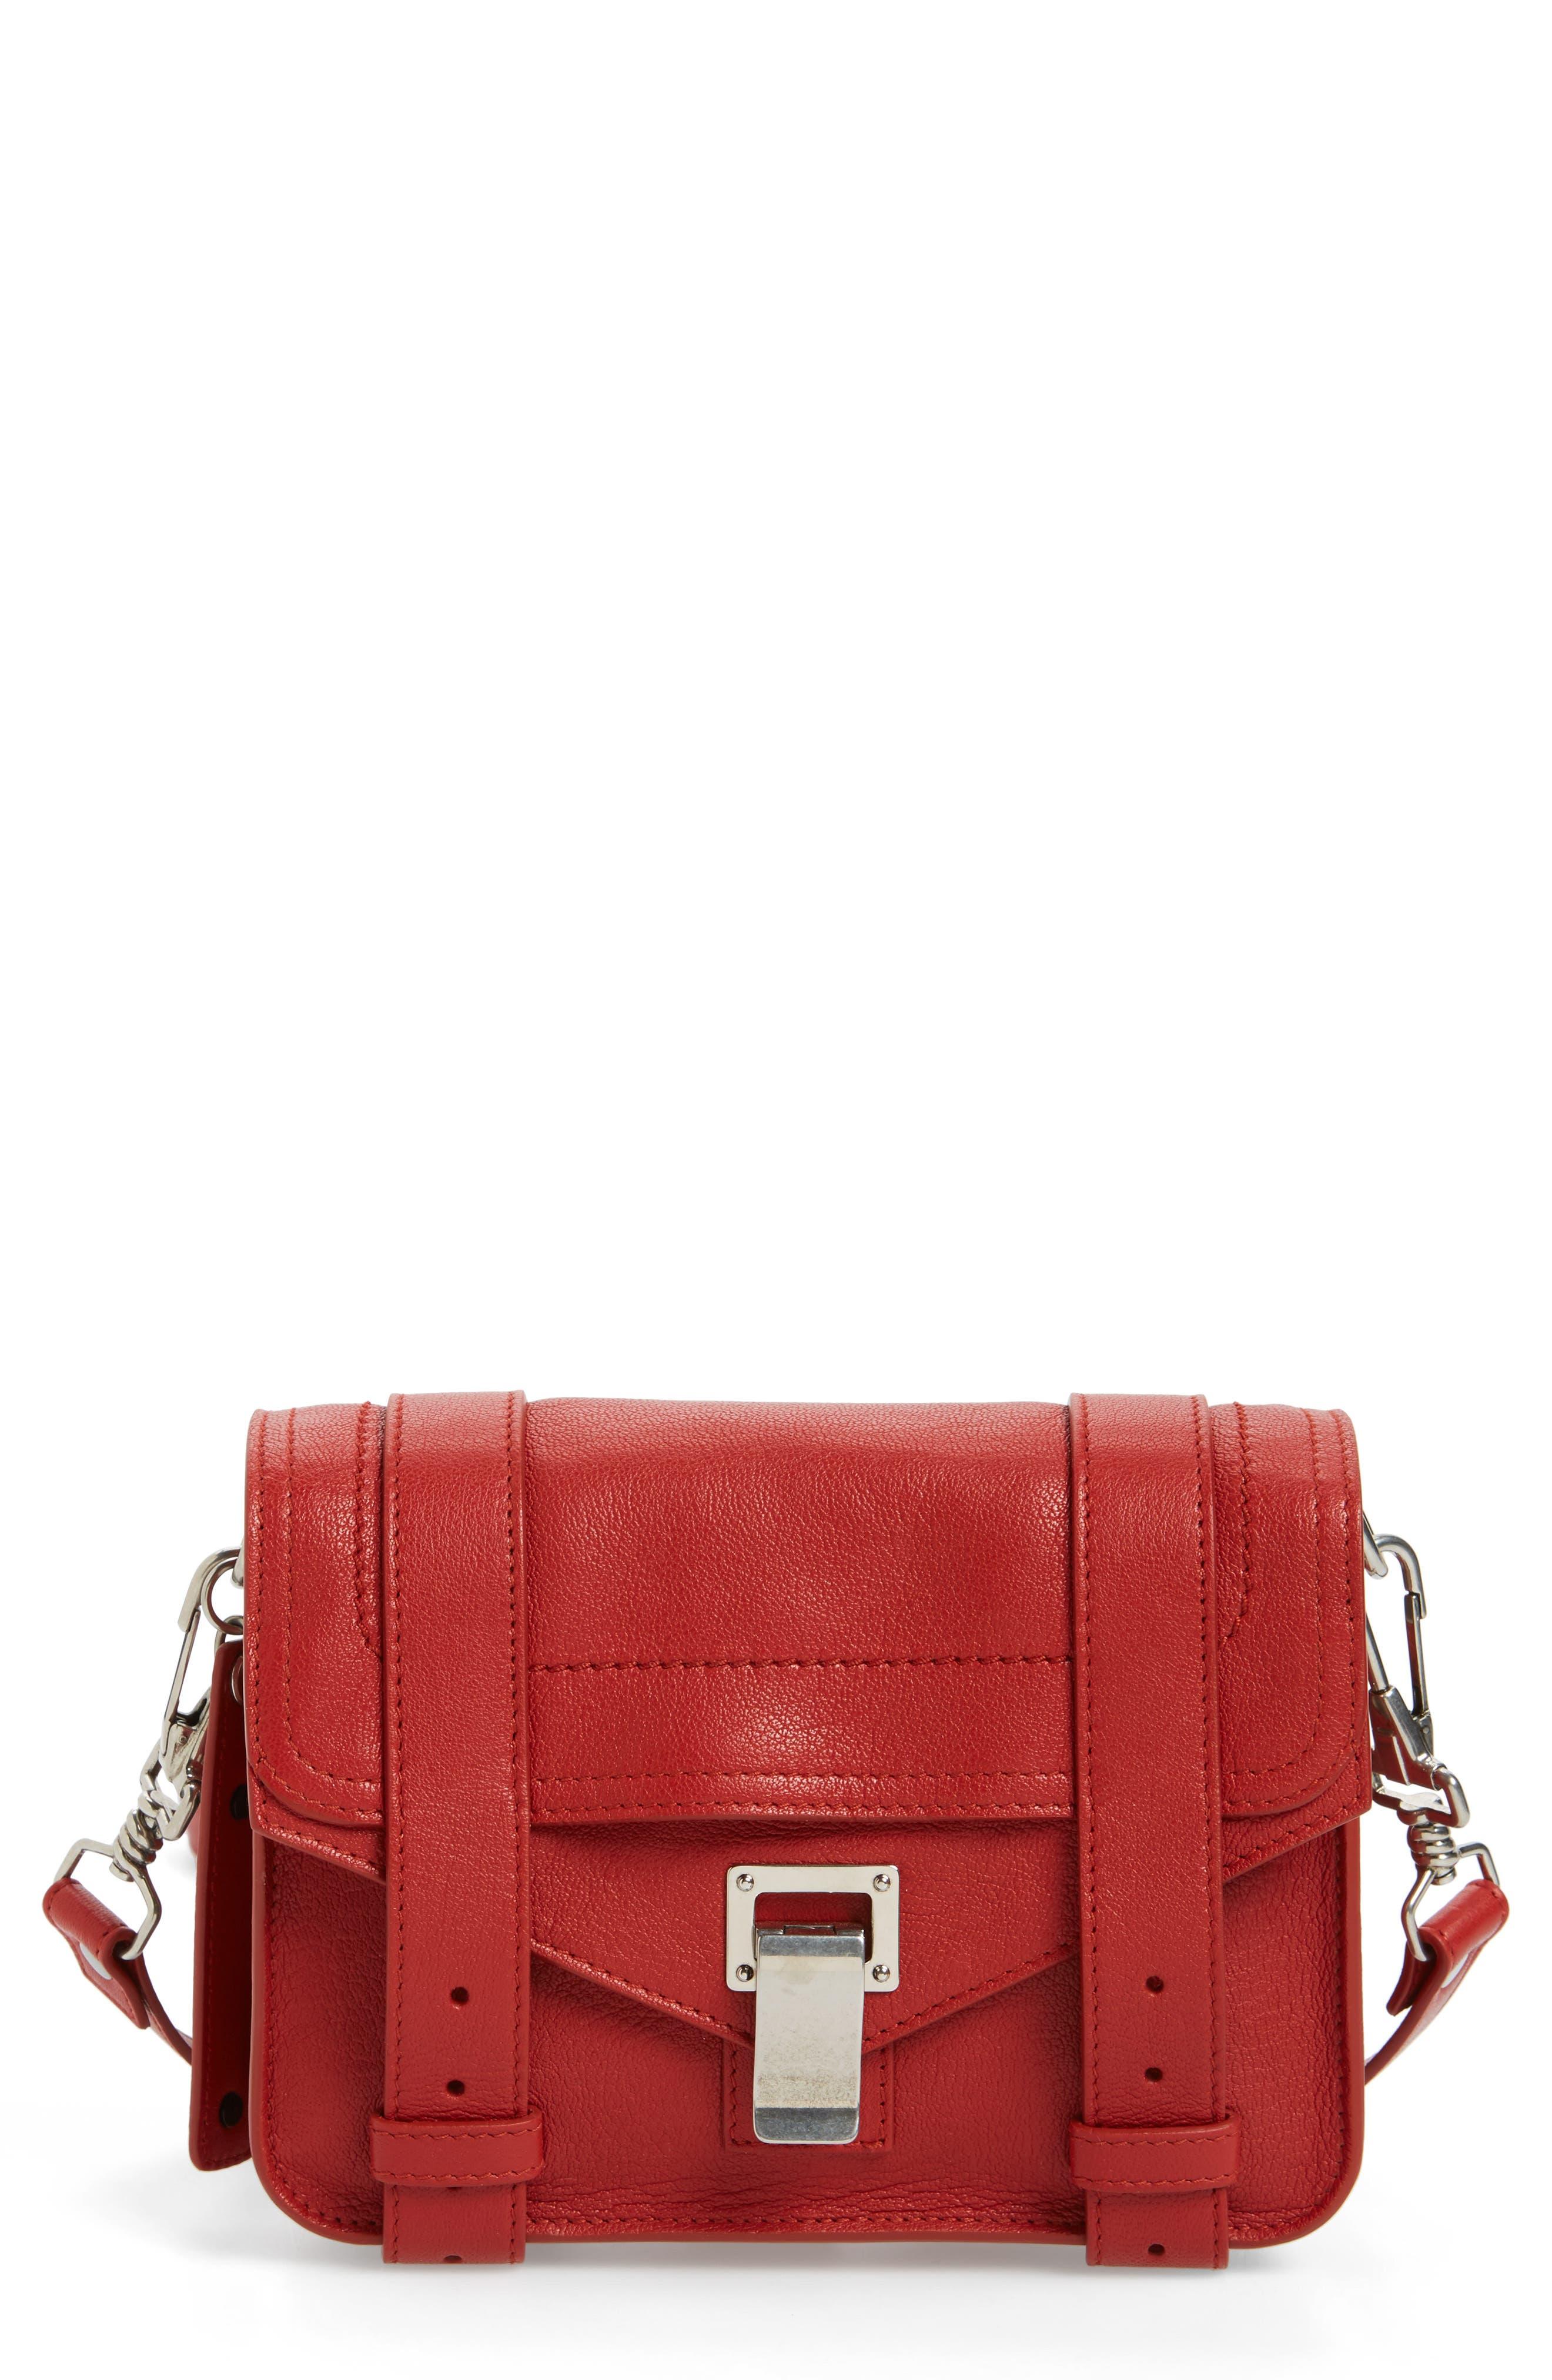 Main Image - Proenza Schouler 'Mini PS1' Lambskin Leather Crossbody Bag